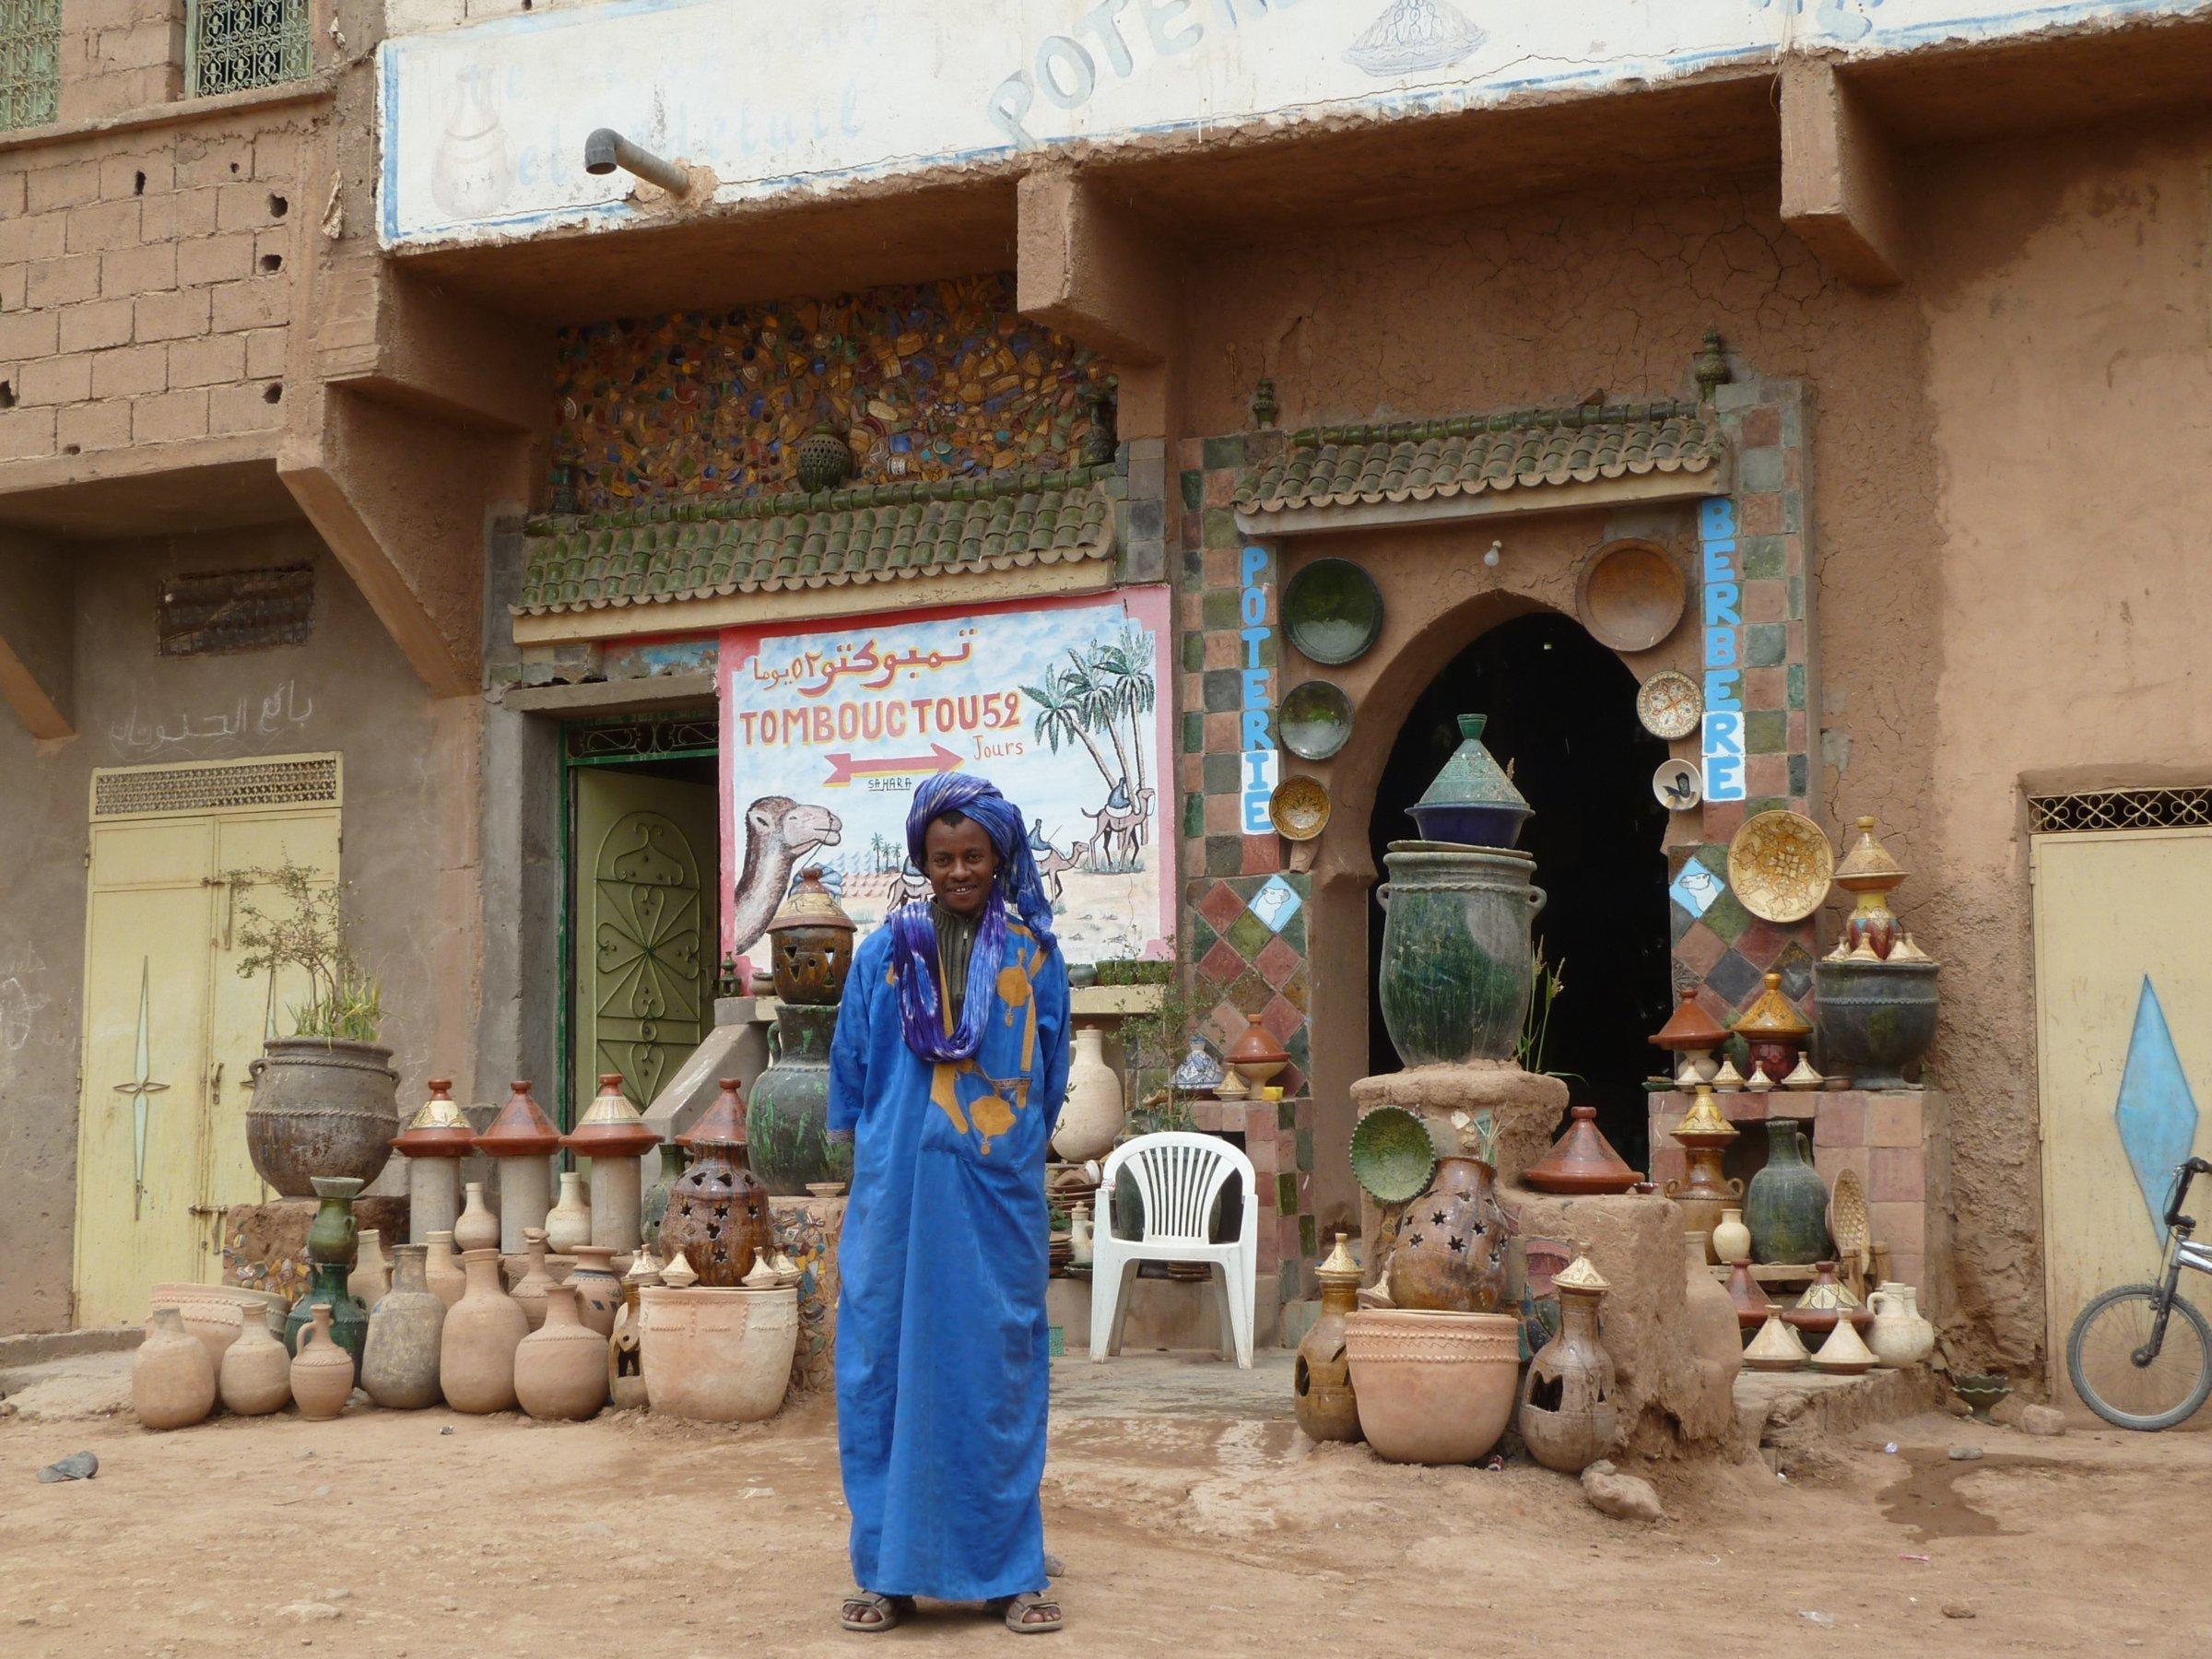 6-Day Marrakesh, High Atlas and Sahara Experiences - Morocco Itinerary